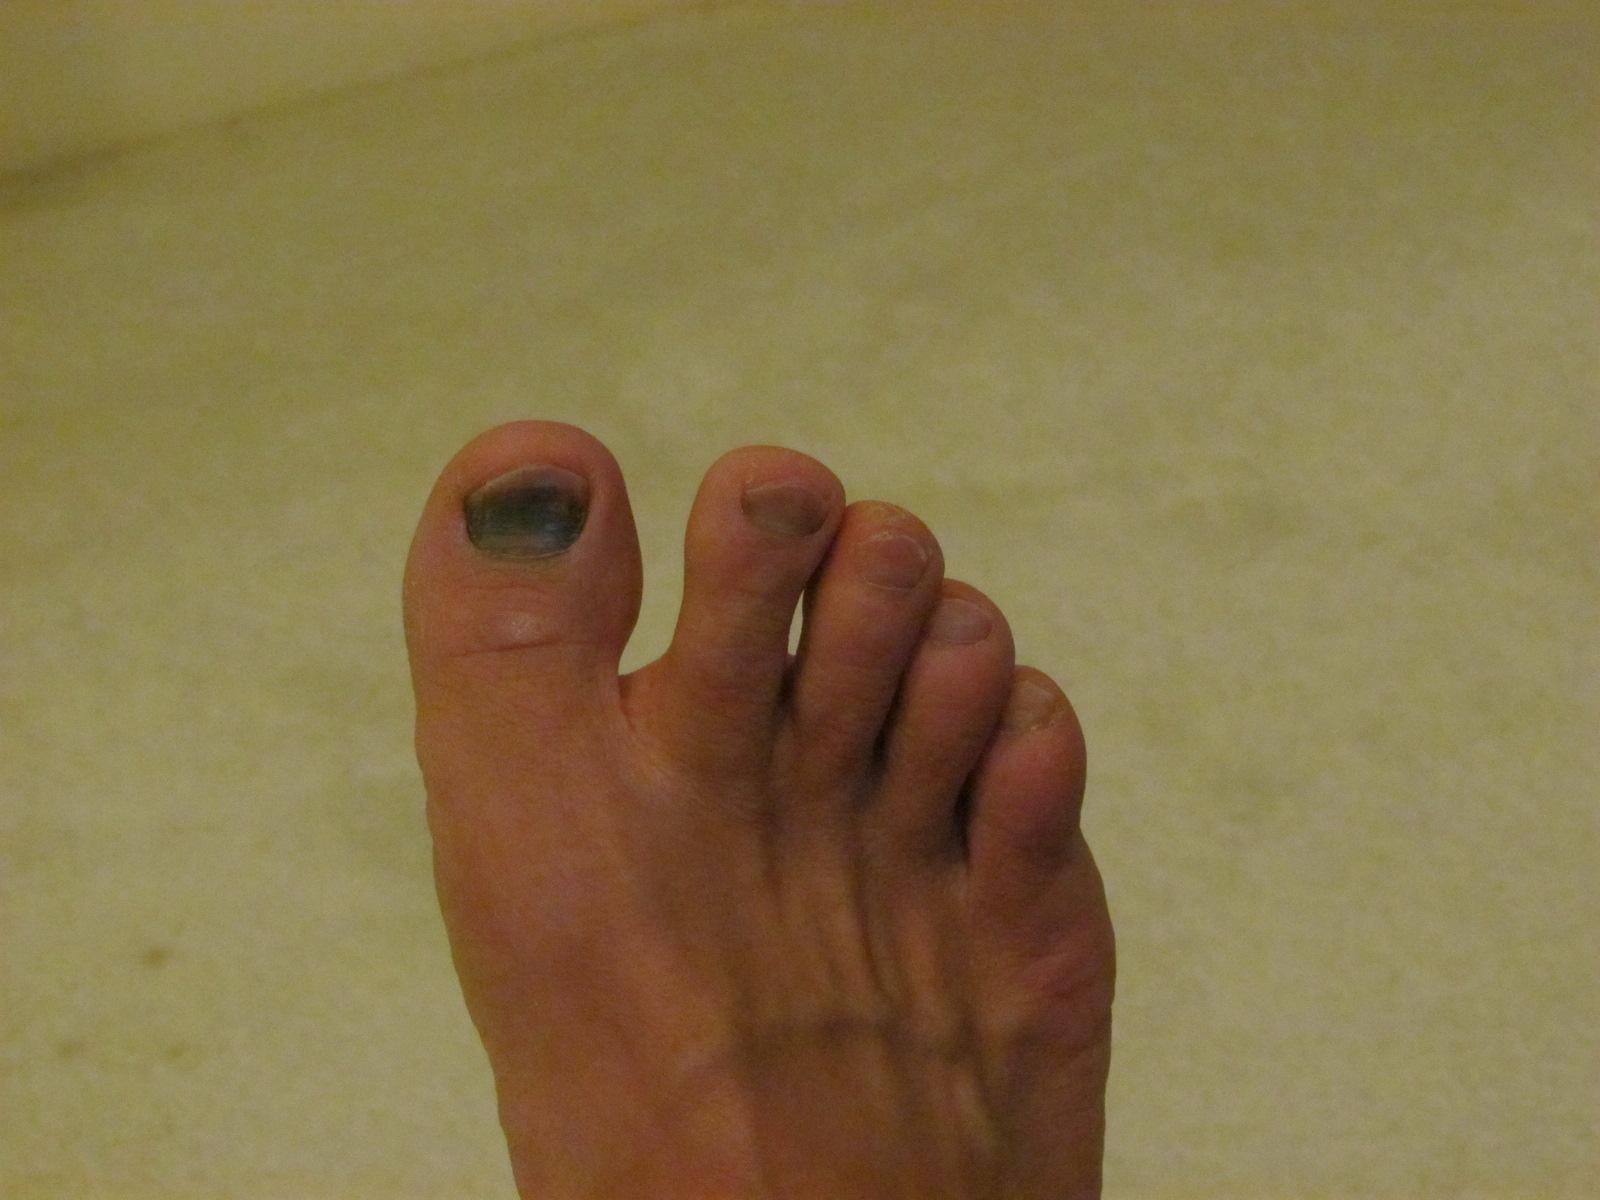 Bruise Under the Big Toenail Treatment